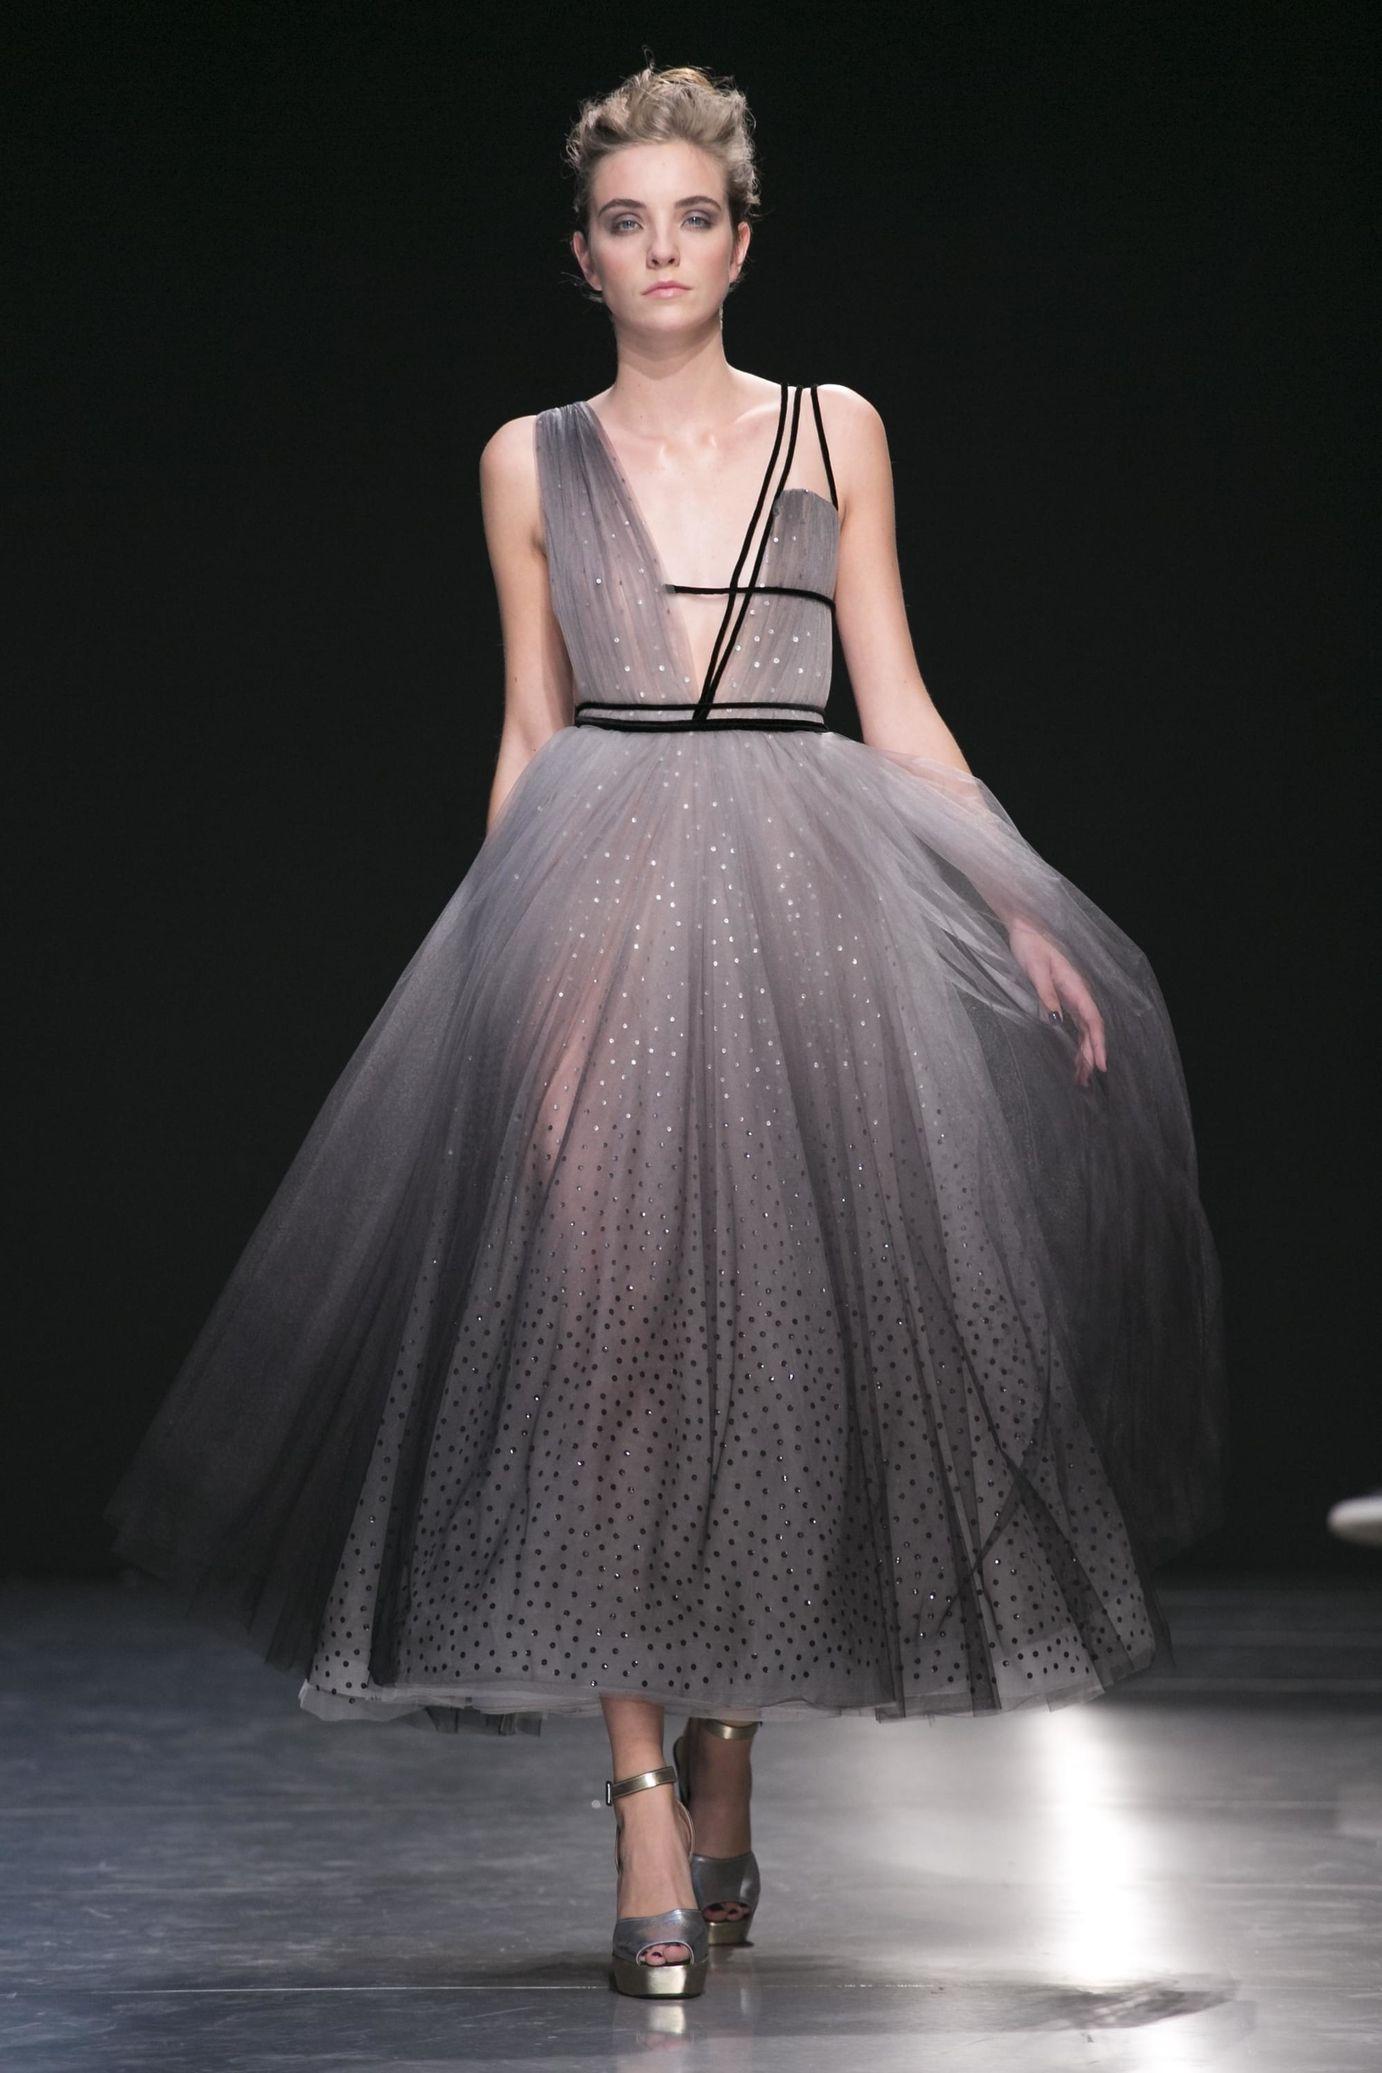 d fil georges chakra haute couture automne hiver 2017 2018 b hne und kleider. Black Bedroom Furniture Sets. Home Design Ideas